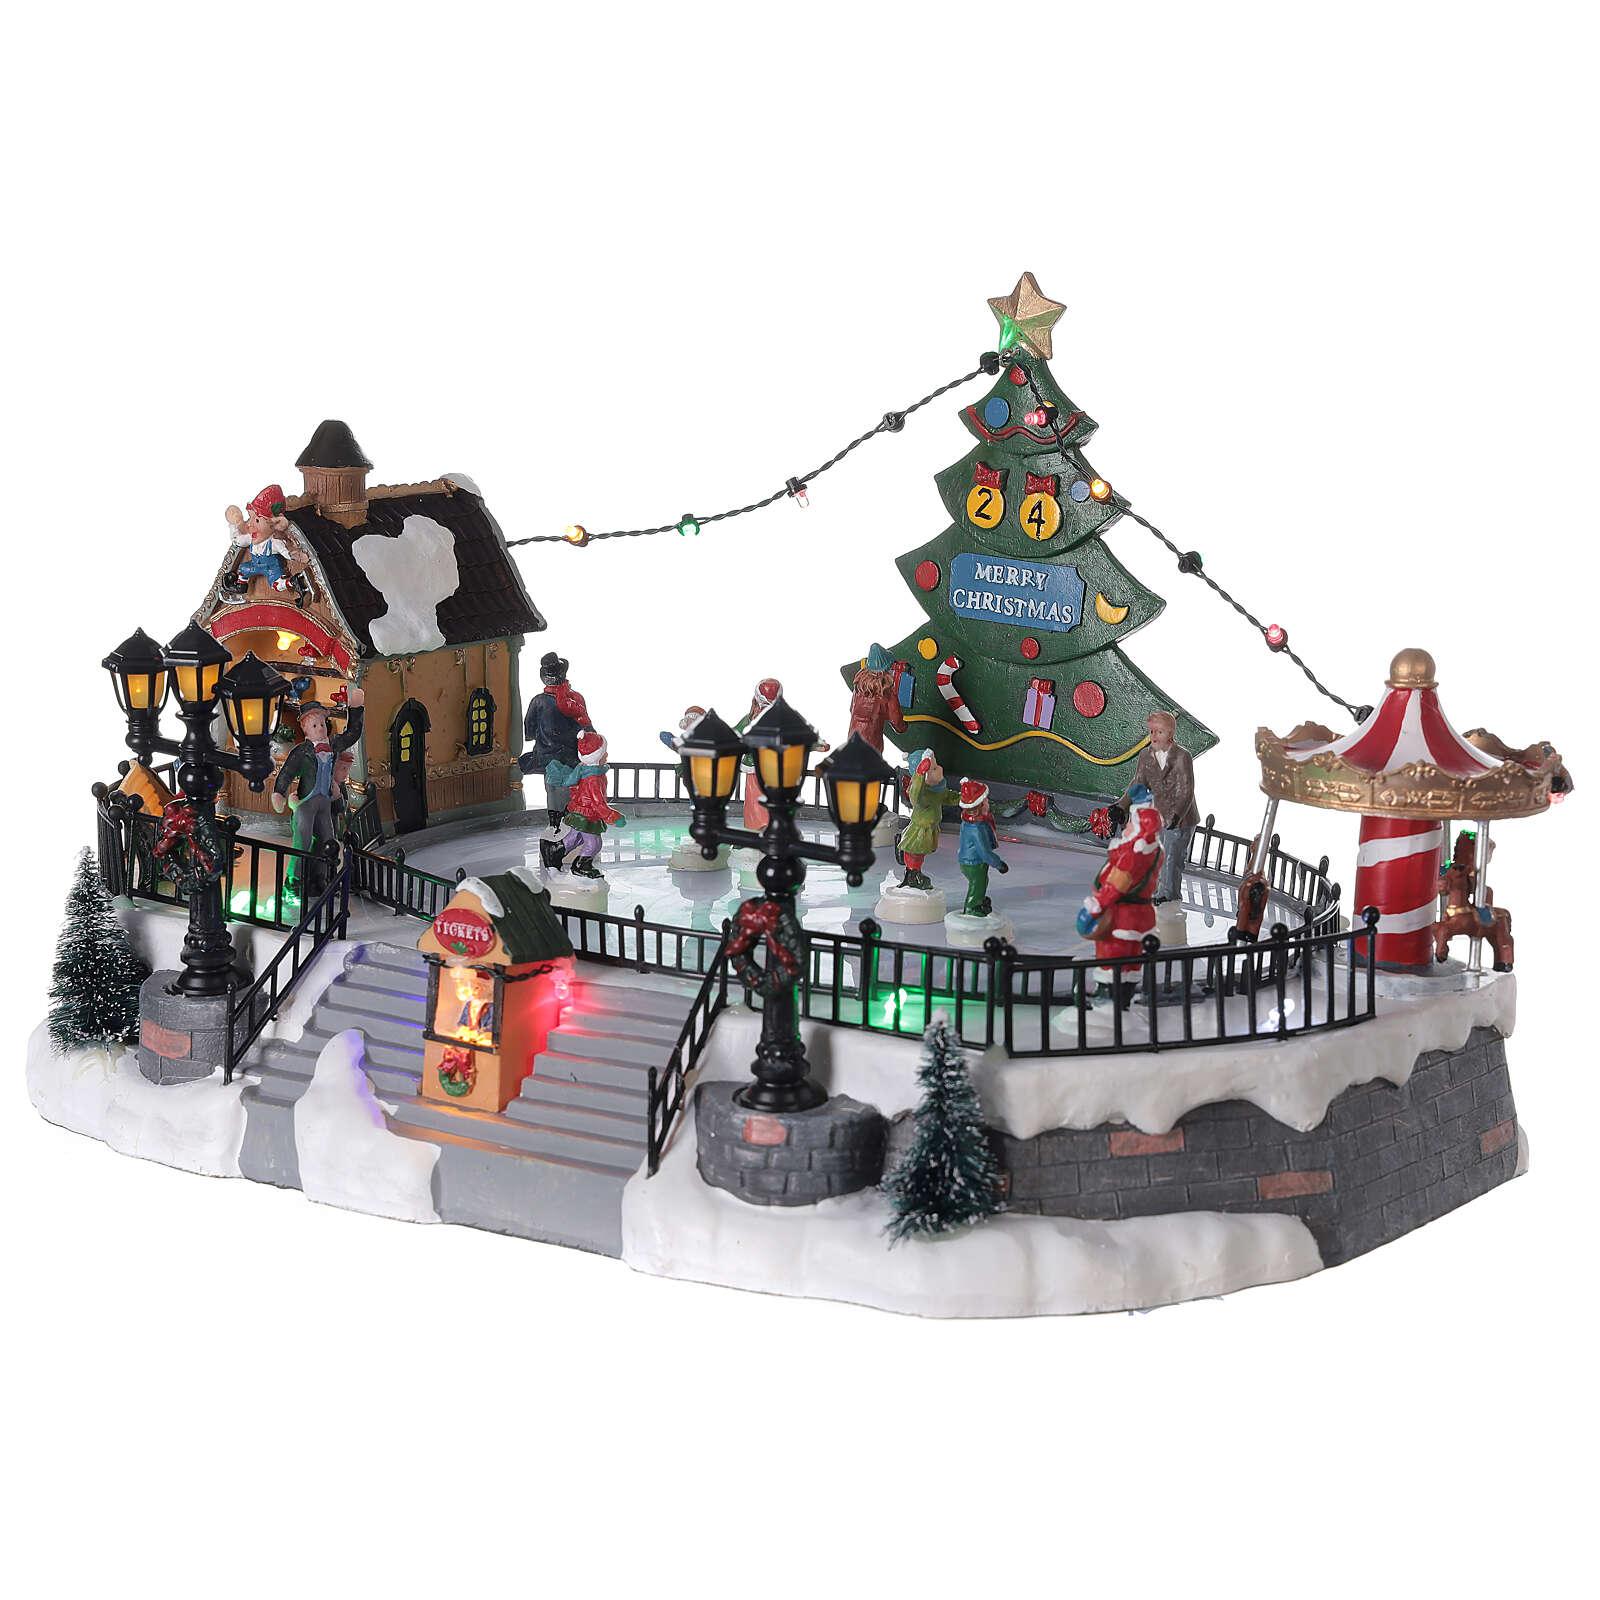 Ice rink Christmas village lights music 20x40x30 cm 3